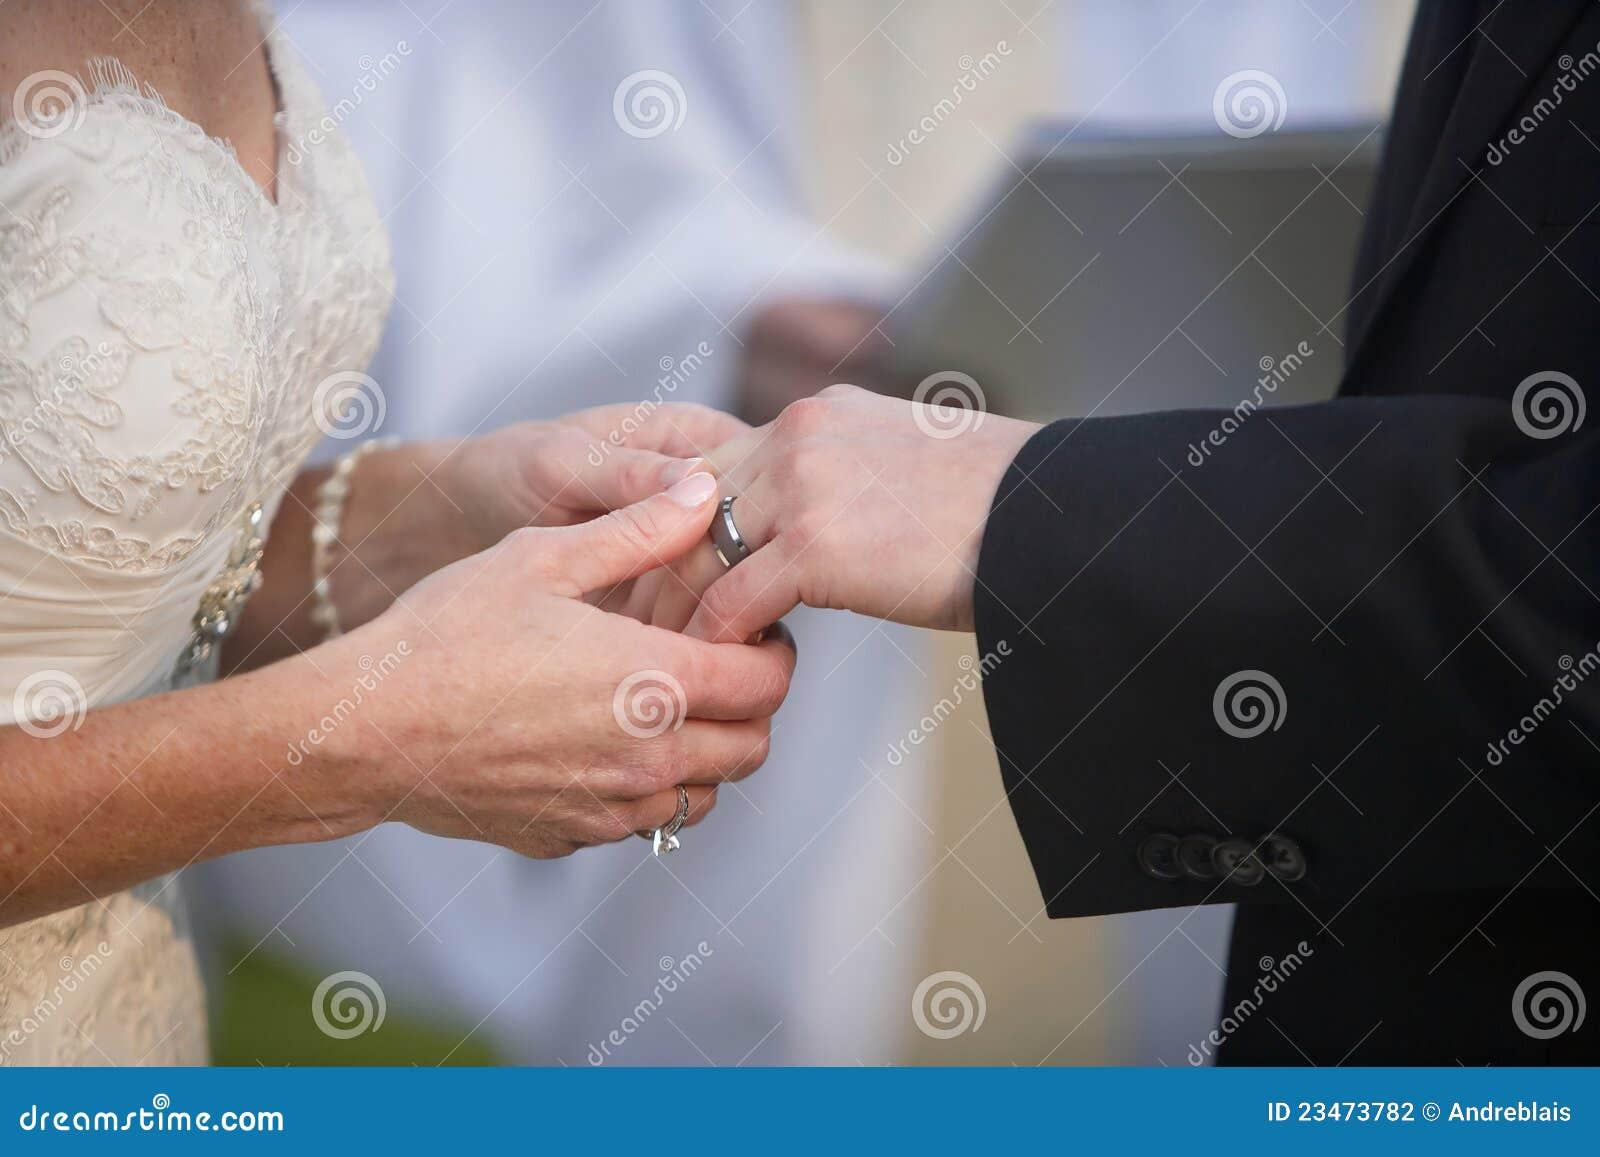 Man Putting Ring On Lady. Stock Photo